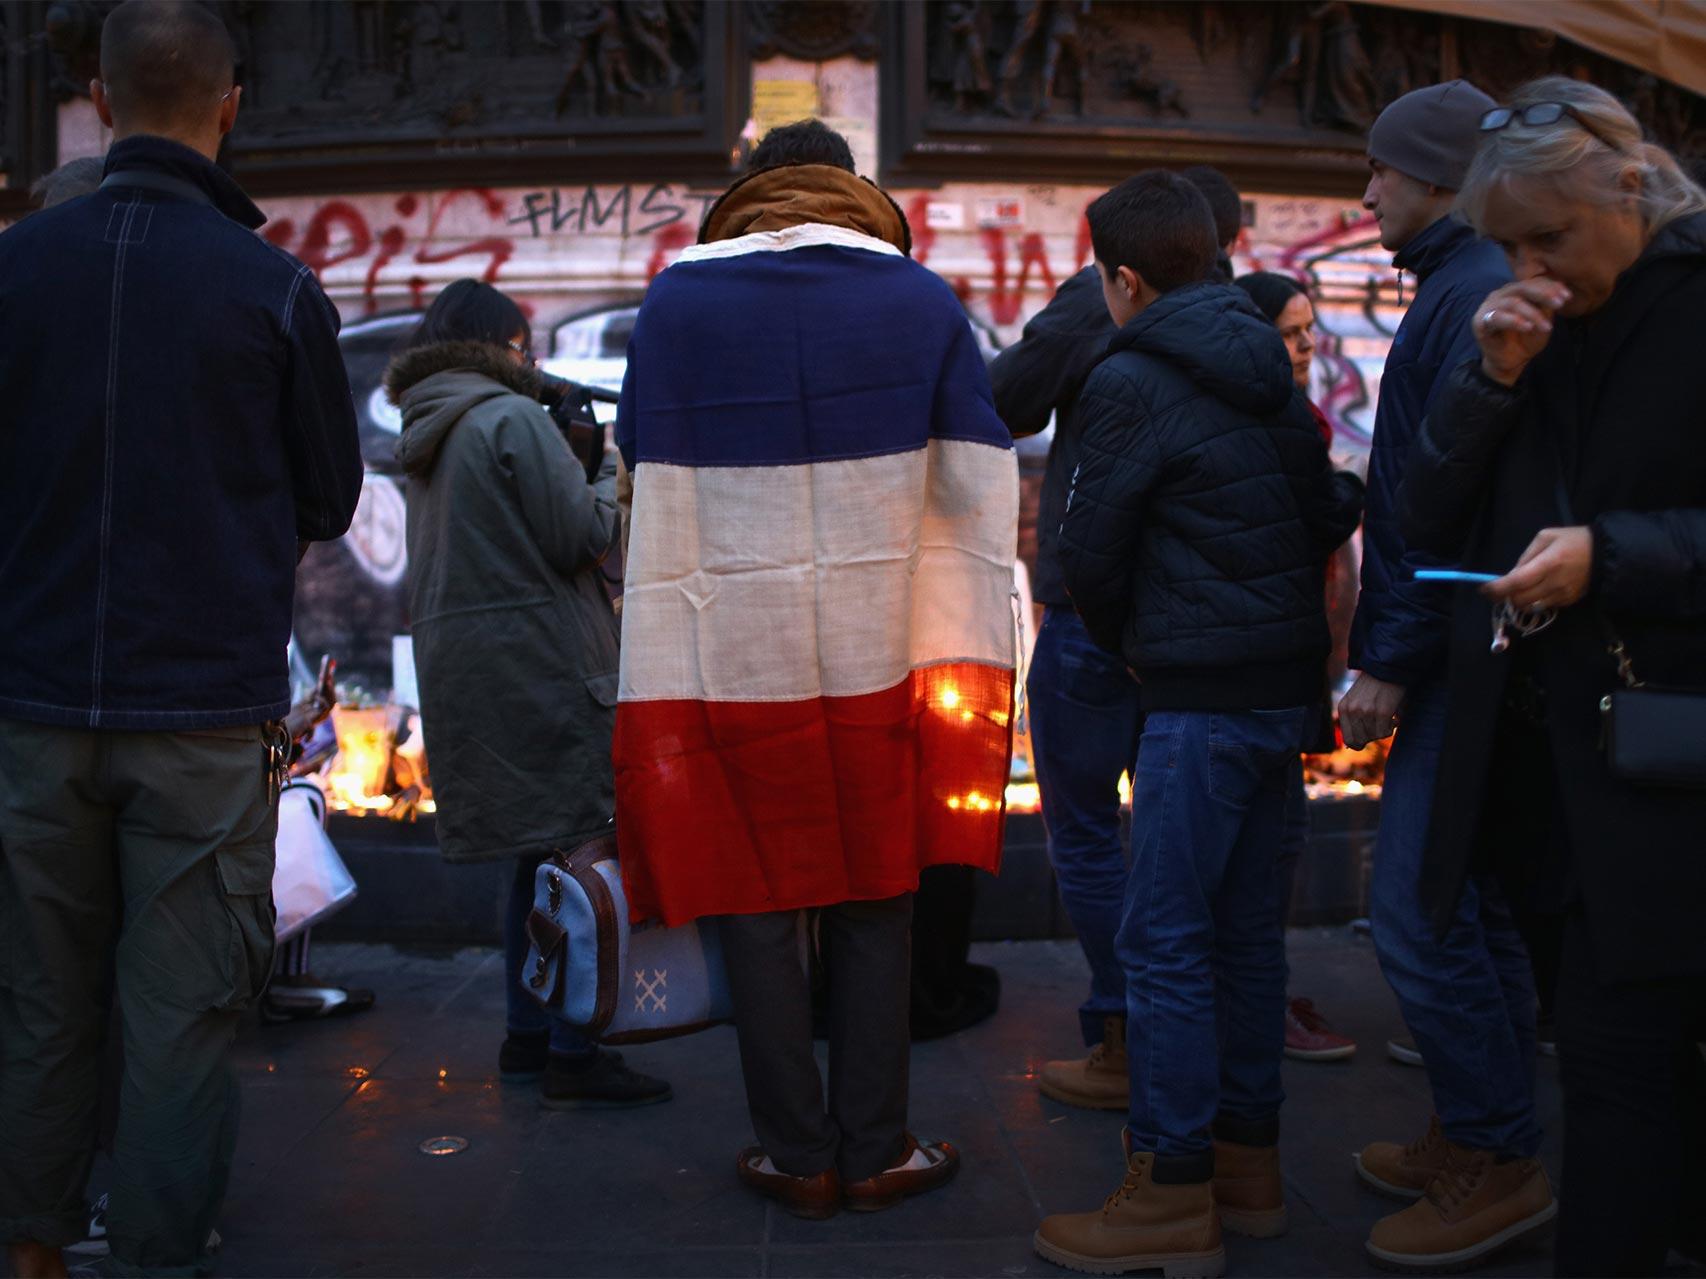 Parisinos colocan velas y mensajes en la Place République.